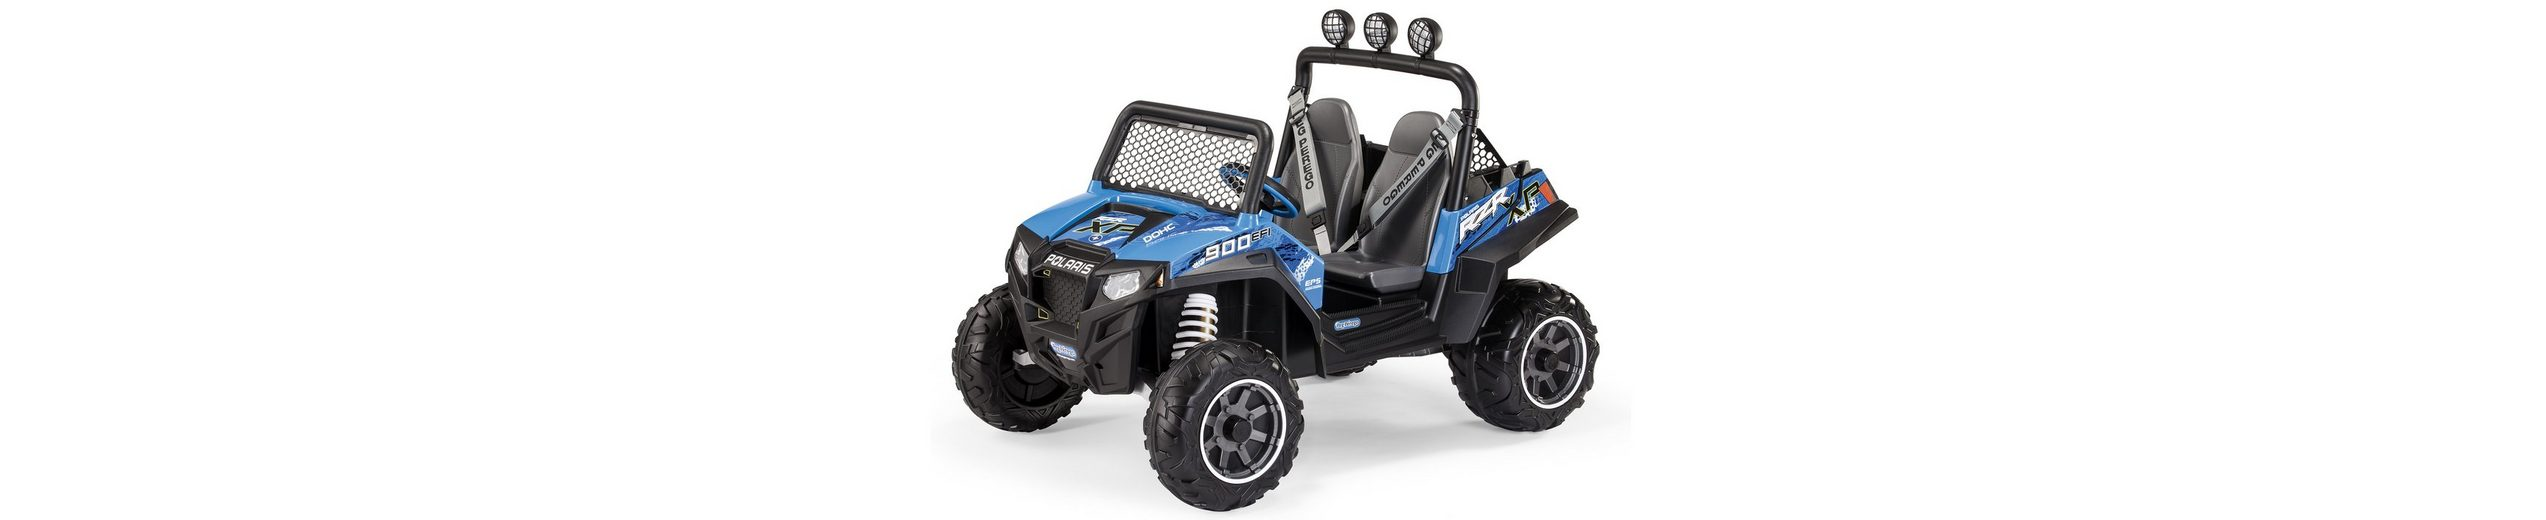 Peg-Pérego Elektrofahrzeug für Kinder Zweisitzer »Polaris Ranger RZR 900 BLU - 12V«